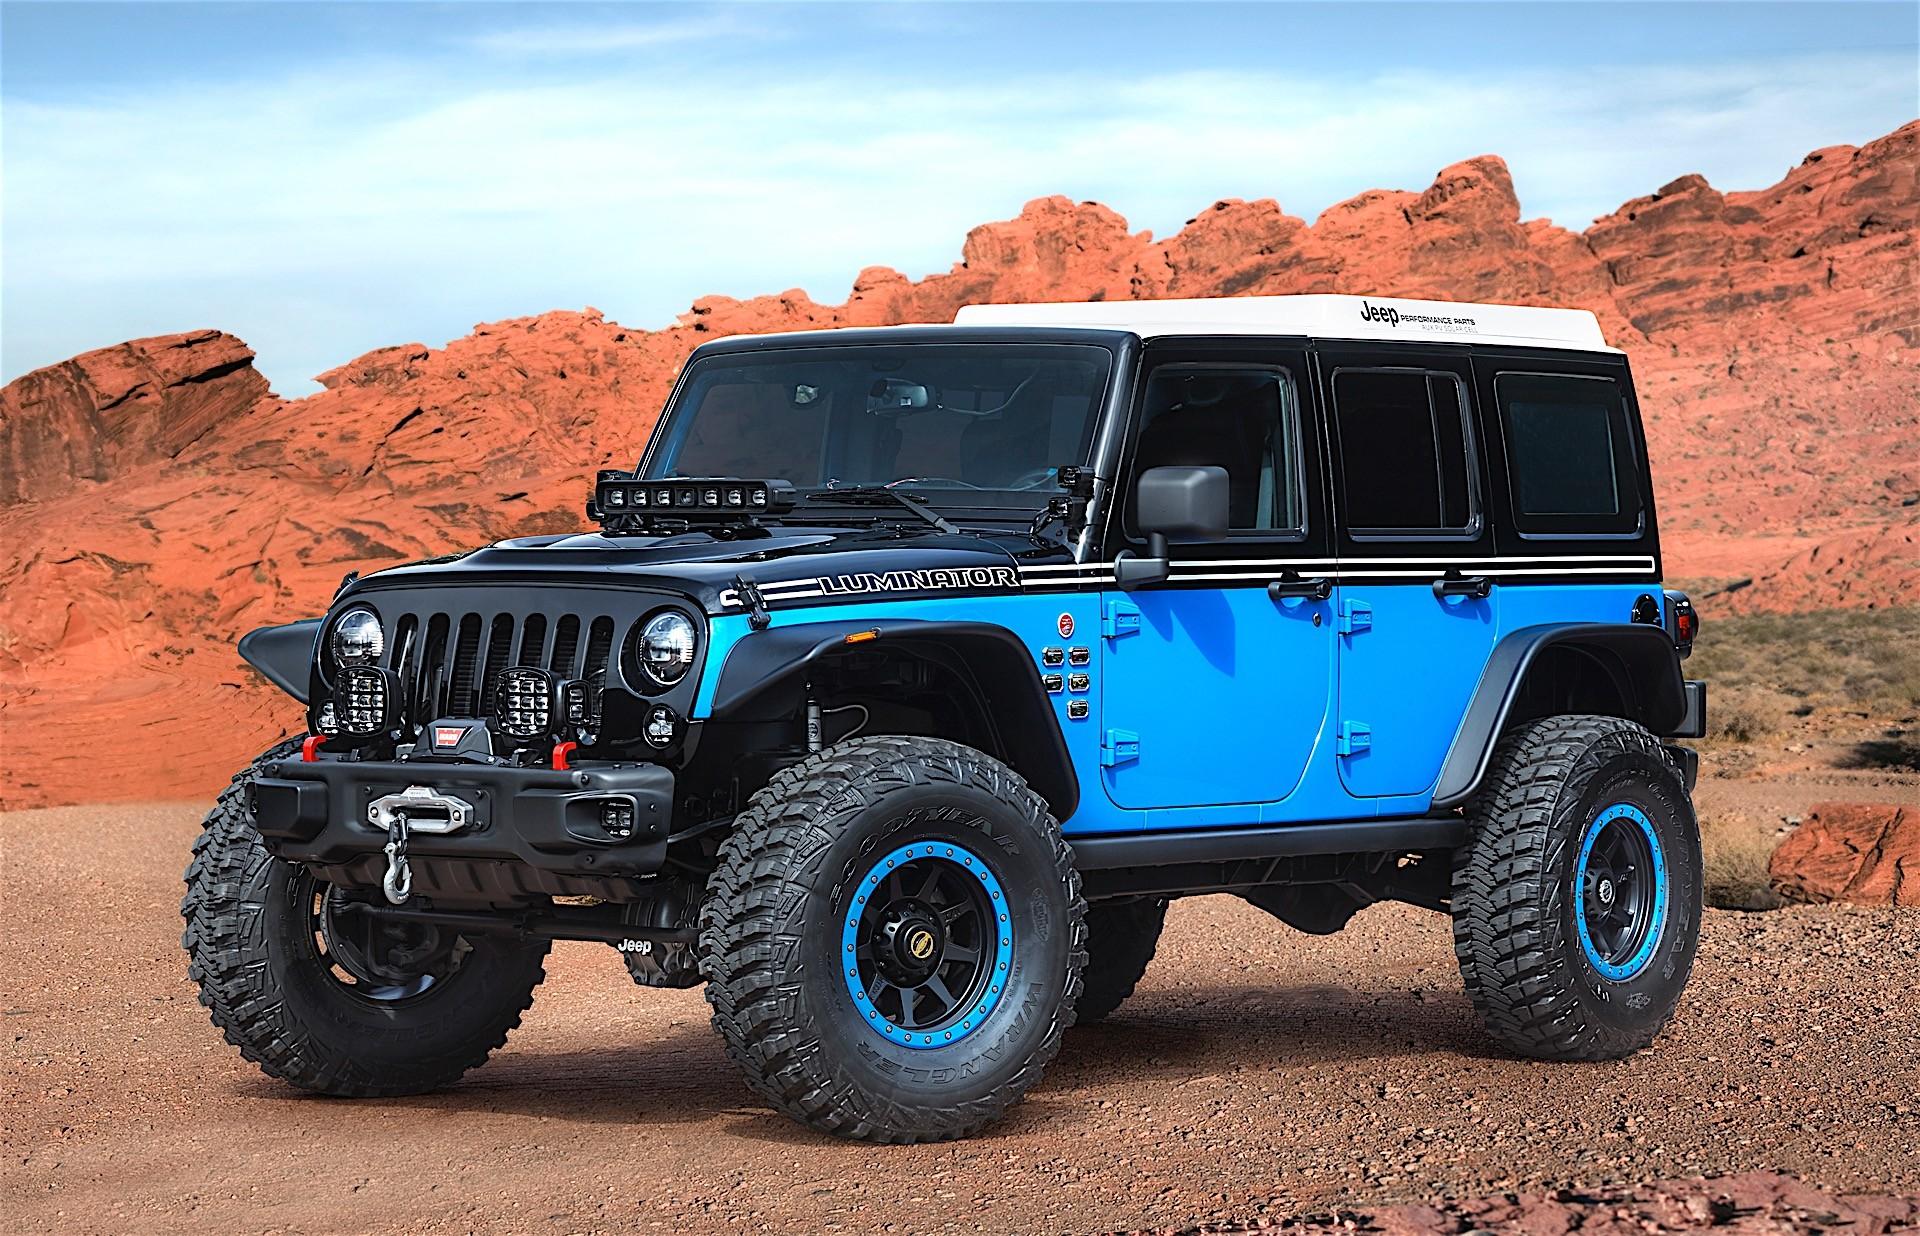 jeep unveils several concept vehicles for 2017 moab easter jeep safari autoevolution. Black Bedroom Furniture Sets. Home Design Ideas